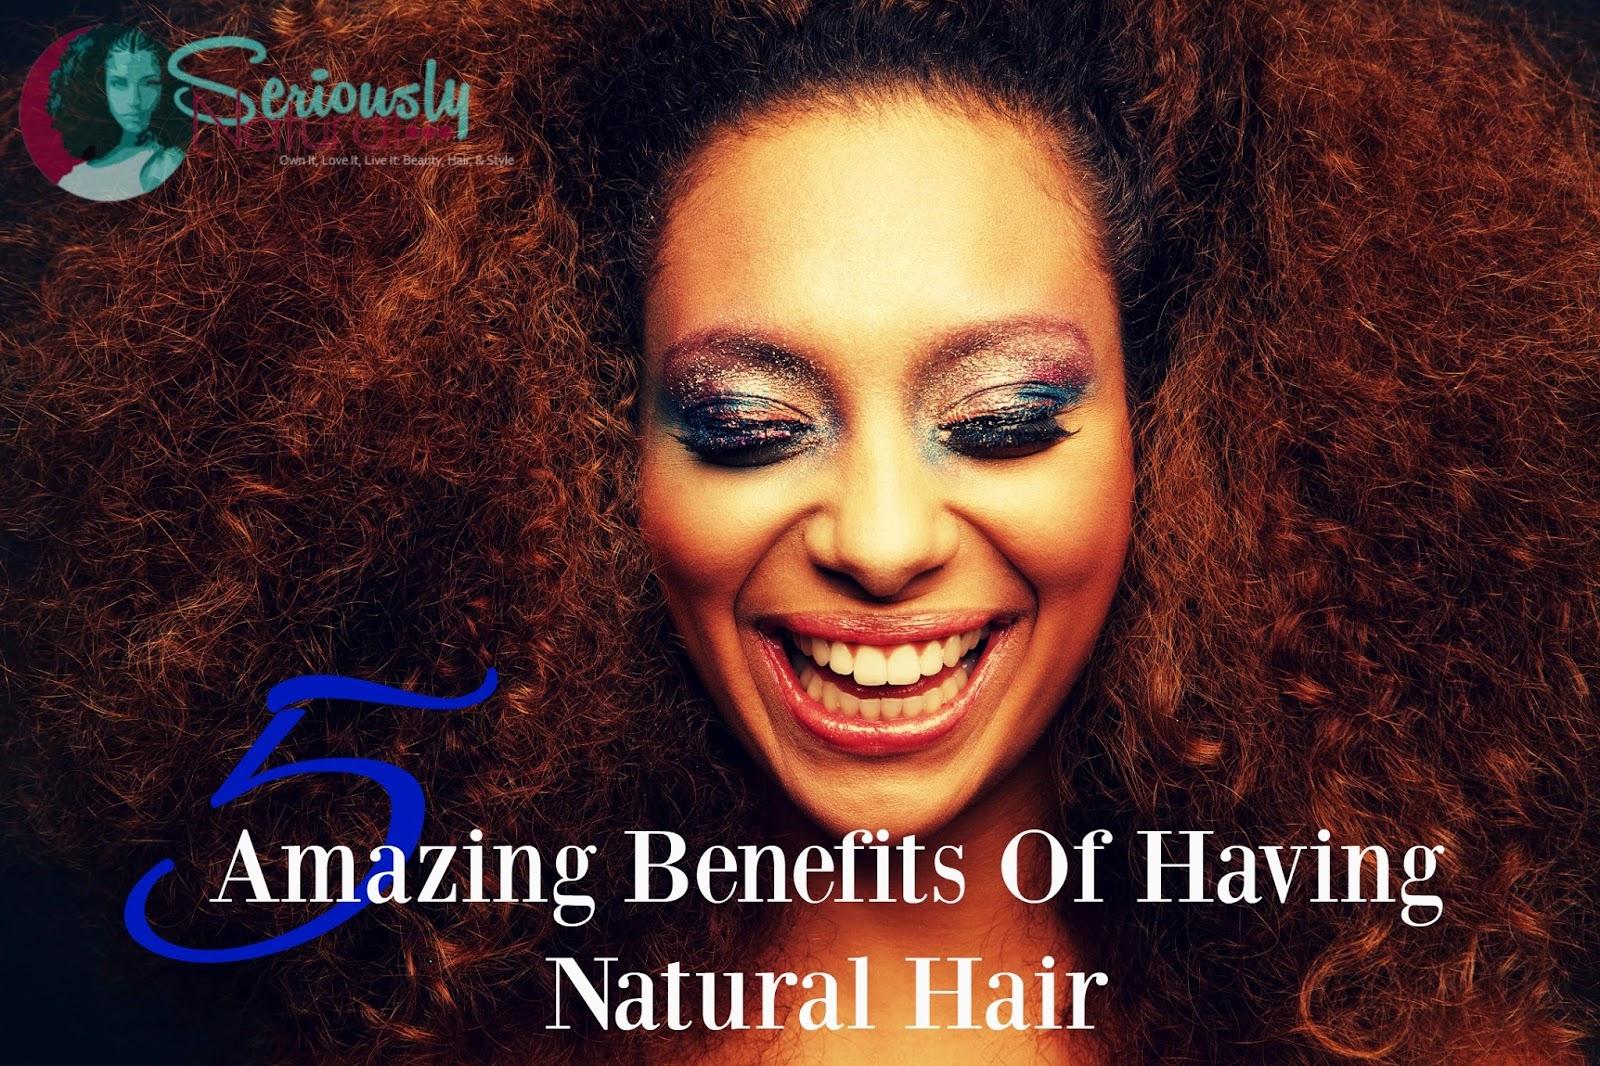 5 Amazing Benefits Of Having Natural Hair